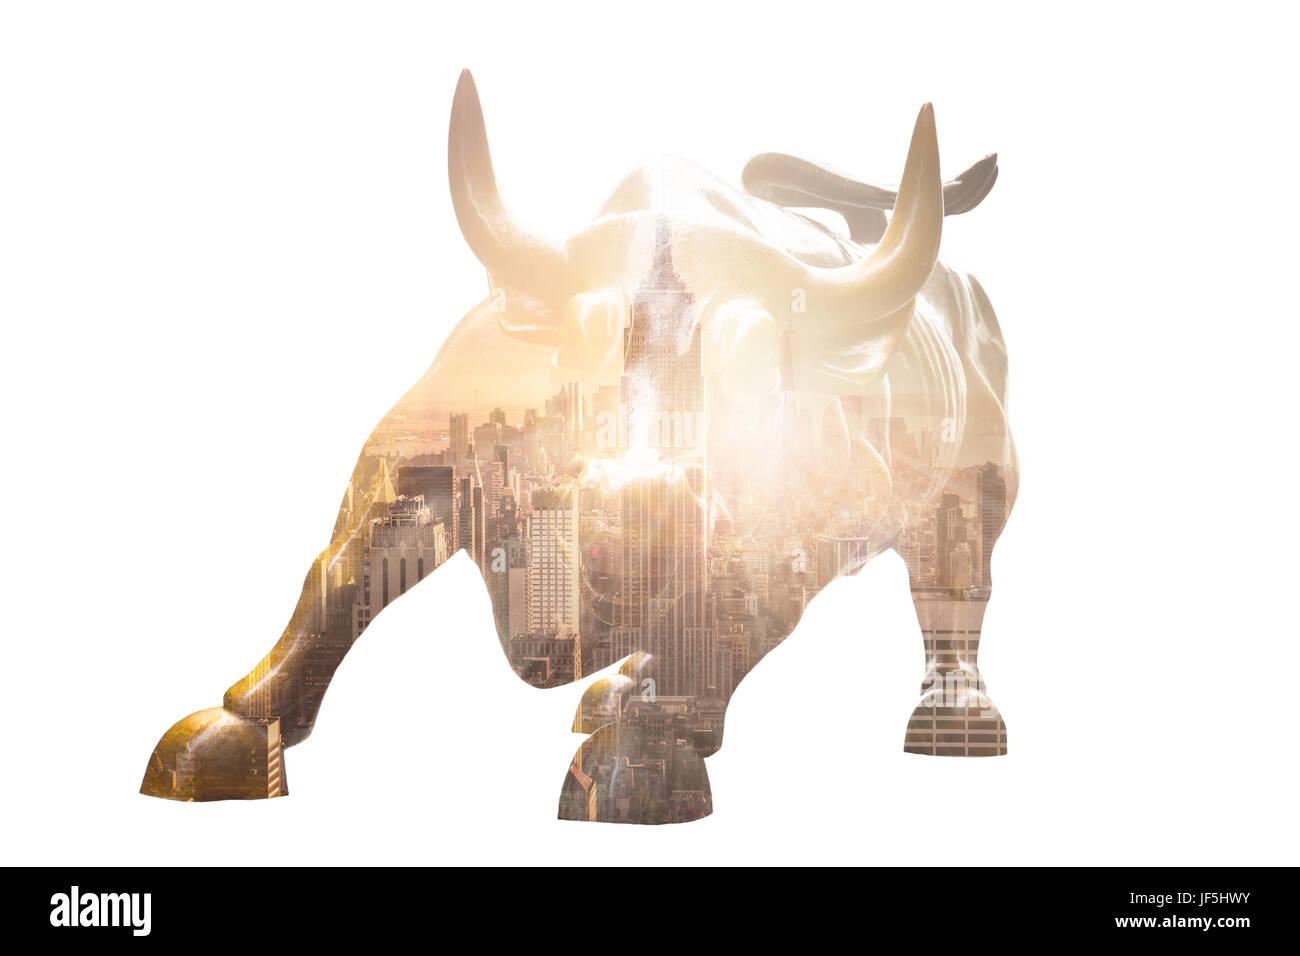 NEW YORK CITY - MAR 26: The landmark Charging Bull in Lower Manhattan represents aggressive financial optimism and - Stock Image